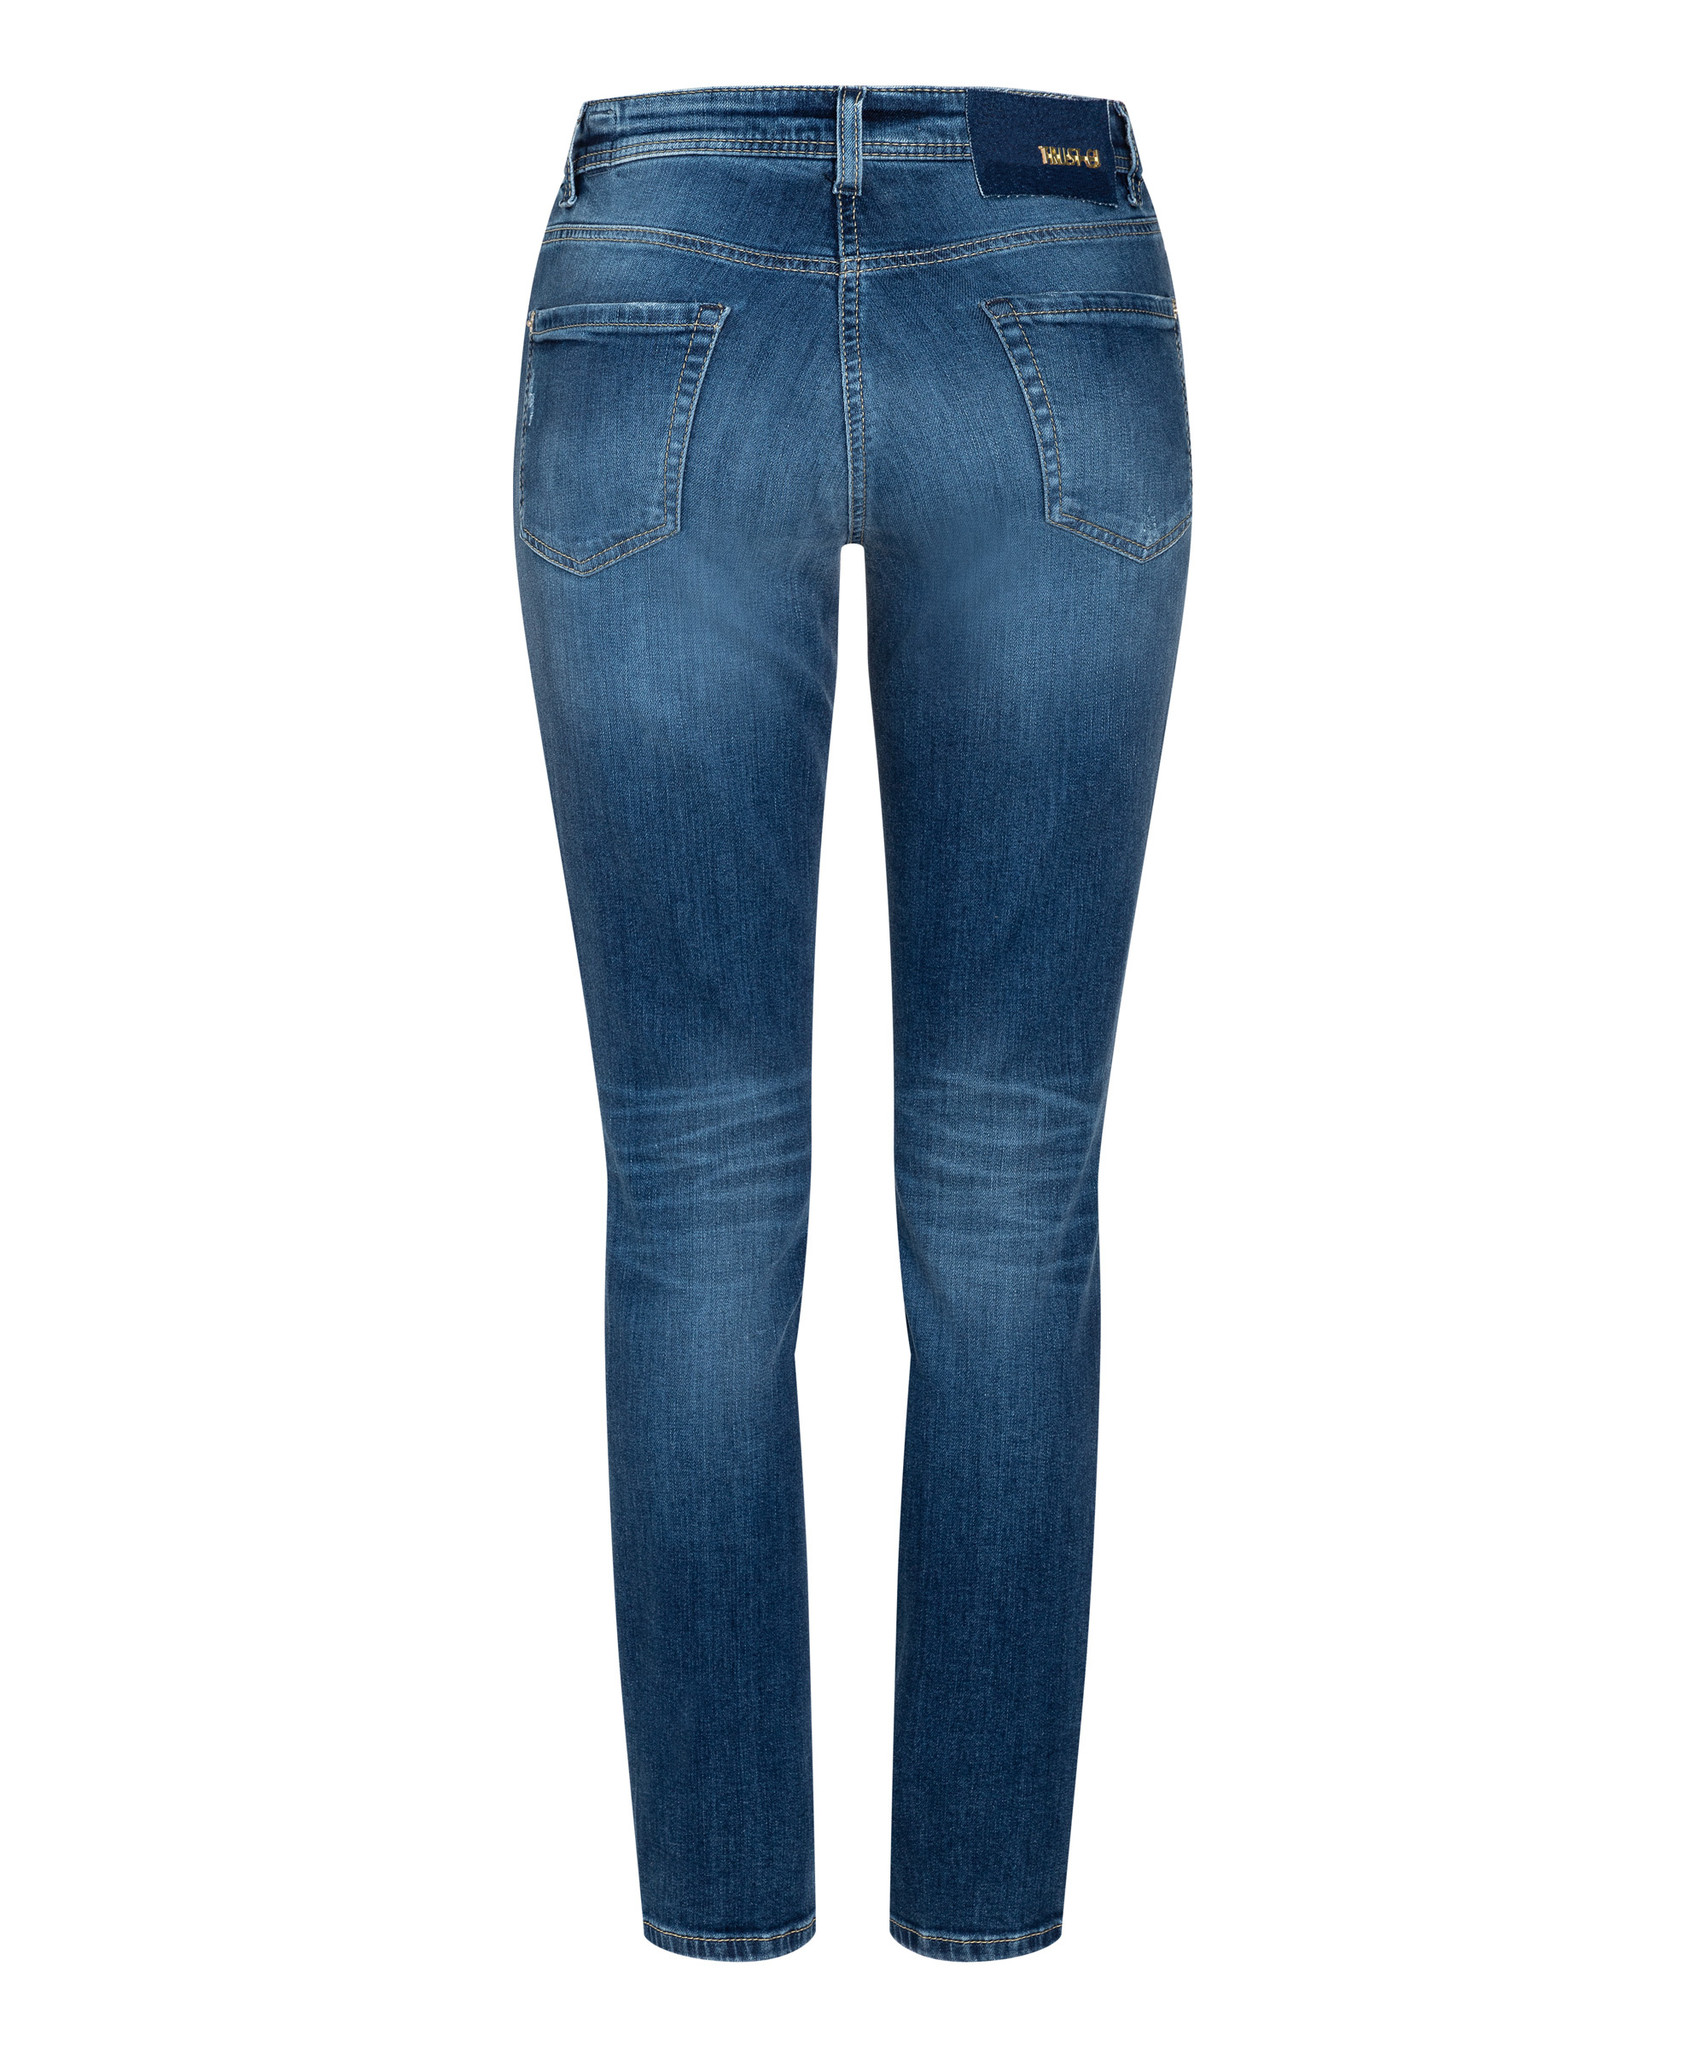 Cambio Jeans 9178G PARLA-2